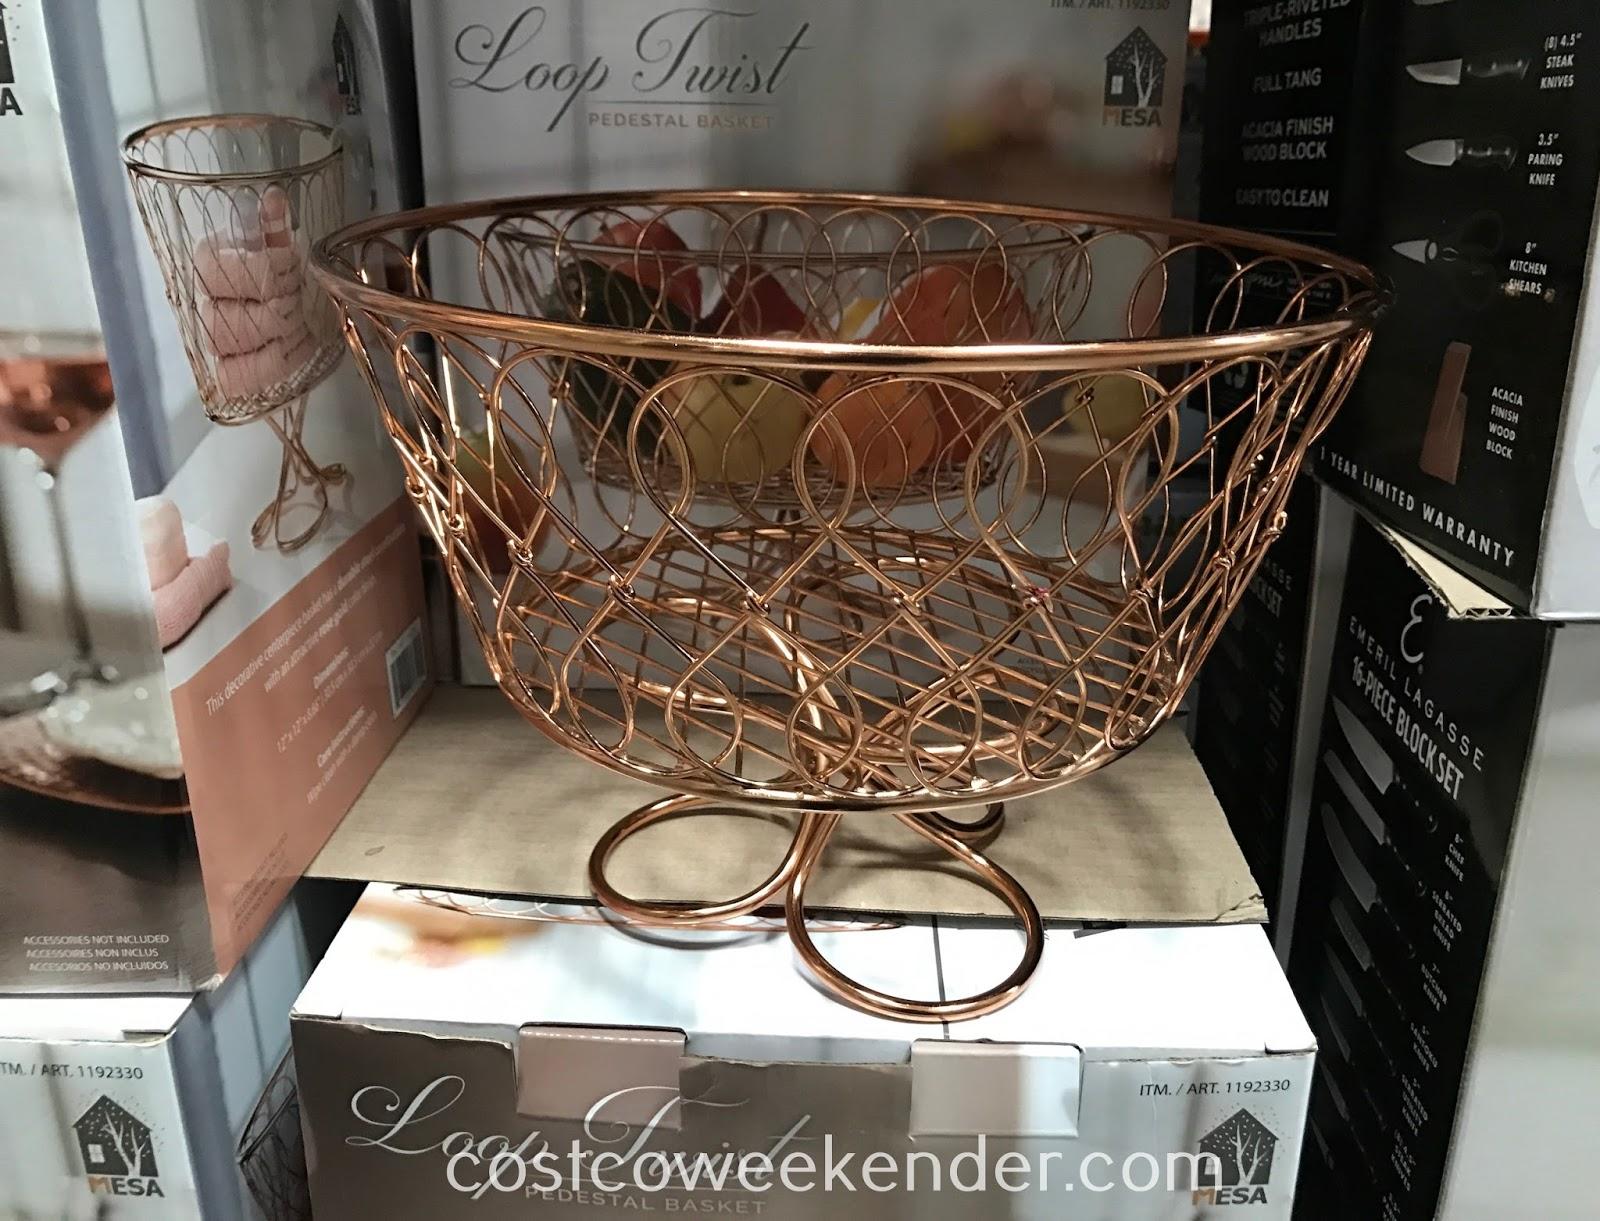 Have a practical vessel to place fruit in with the Vanderbilt Loop Twist Pedestal Basket